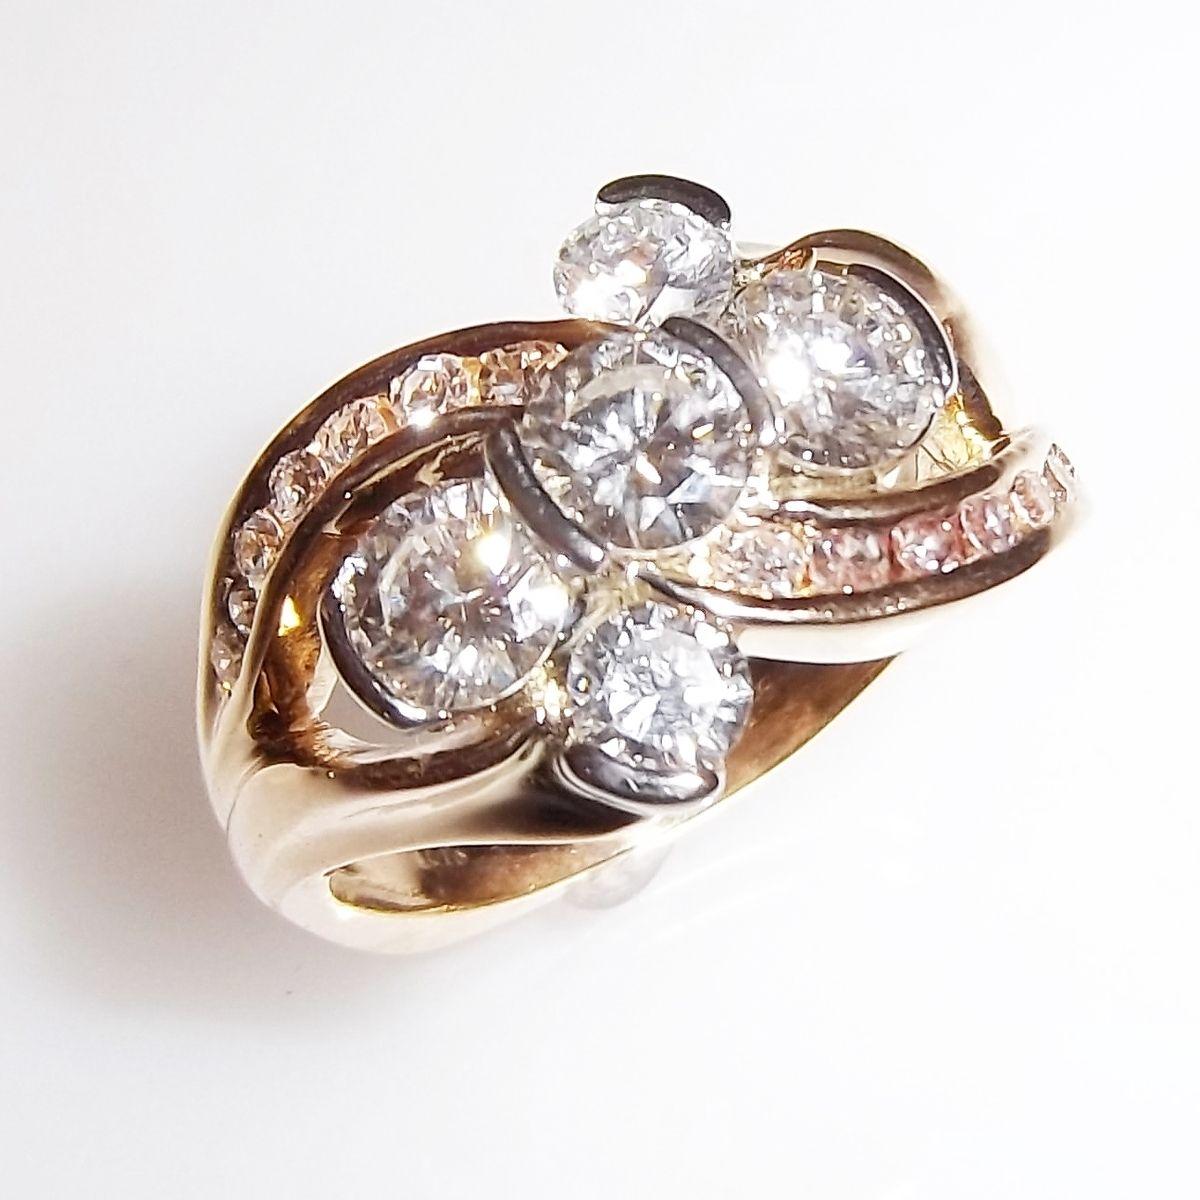 new 50th wedding anniversary rings with custom made a 50th wedding anniversary gift of custom rings - Wedding Anniversary Rings